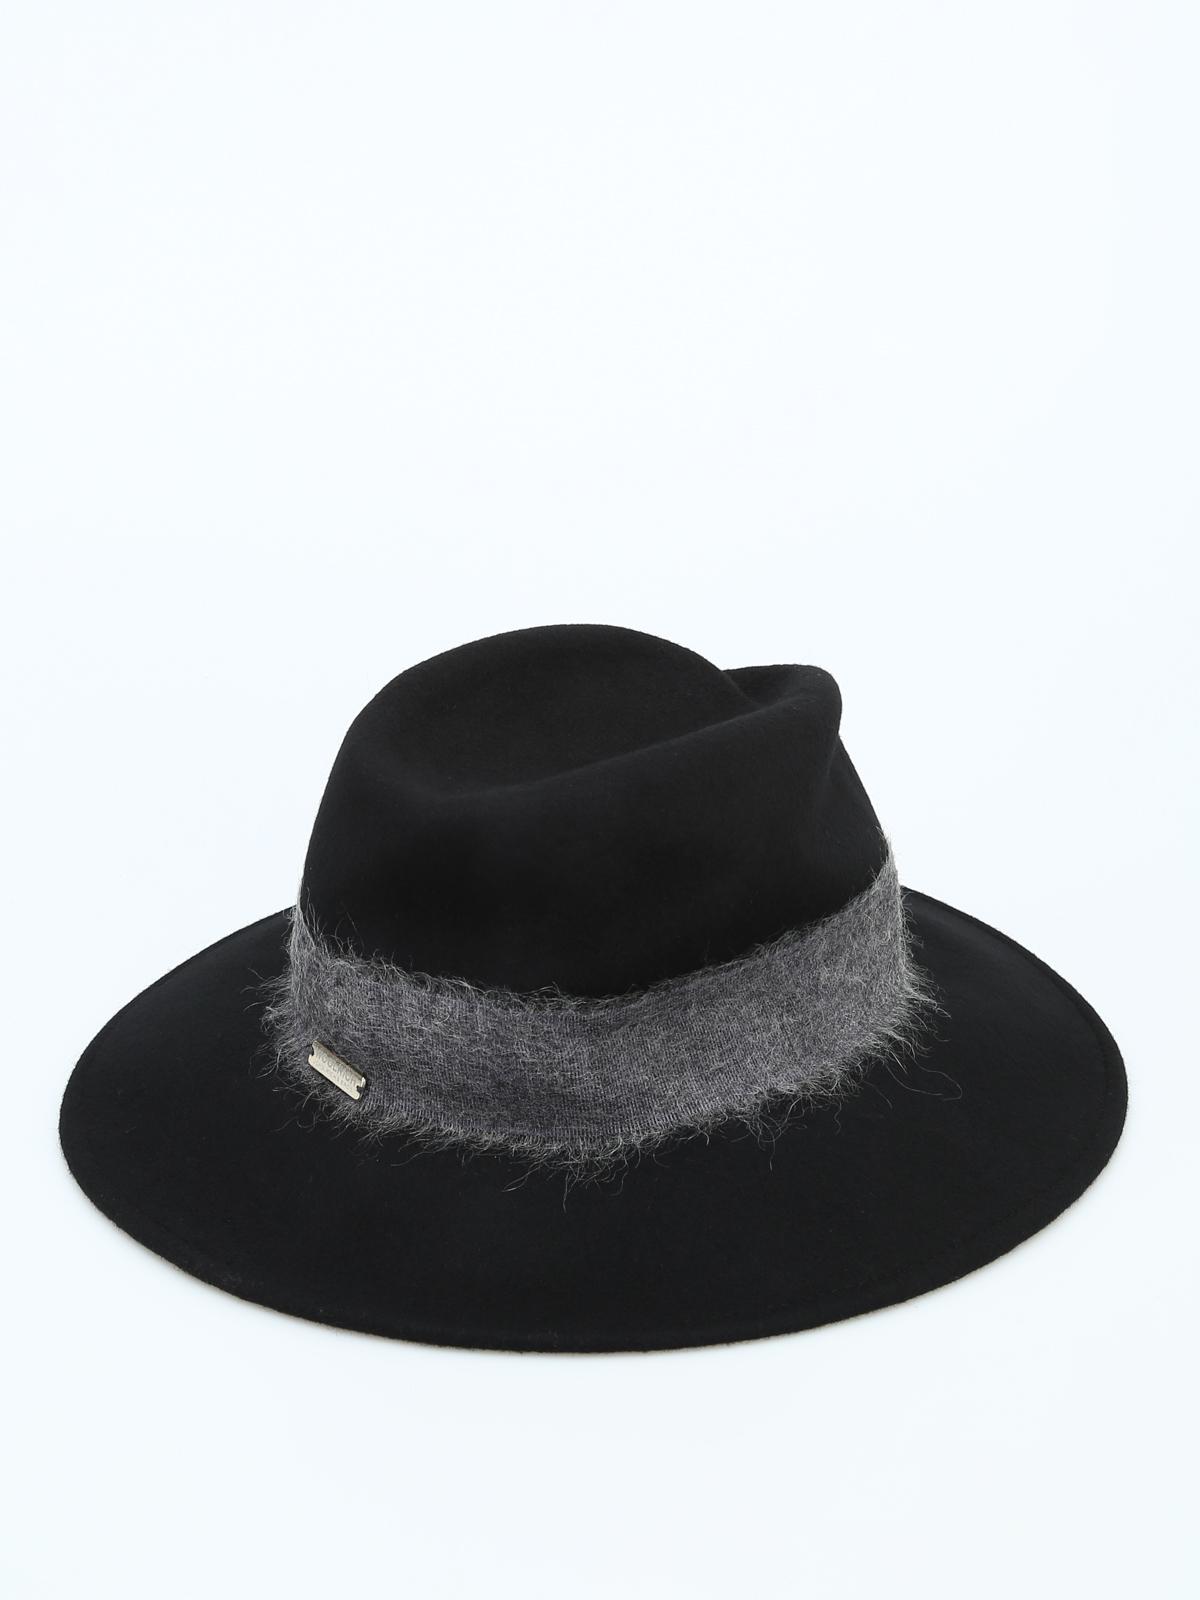 iKRIX WOOLRICH  cappelli - Cappello in feltro con fascia a contrasto 3a91cc80186a